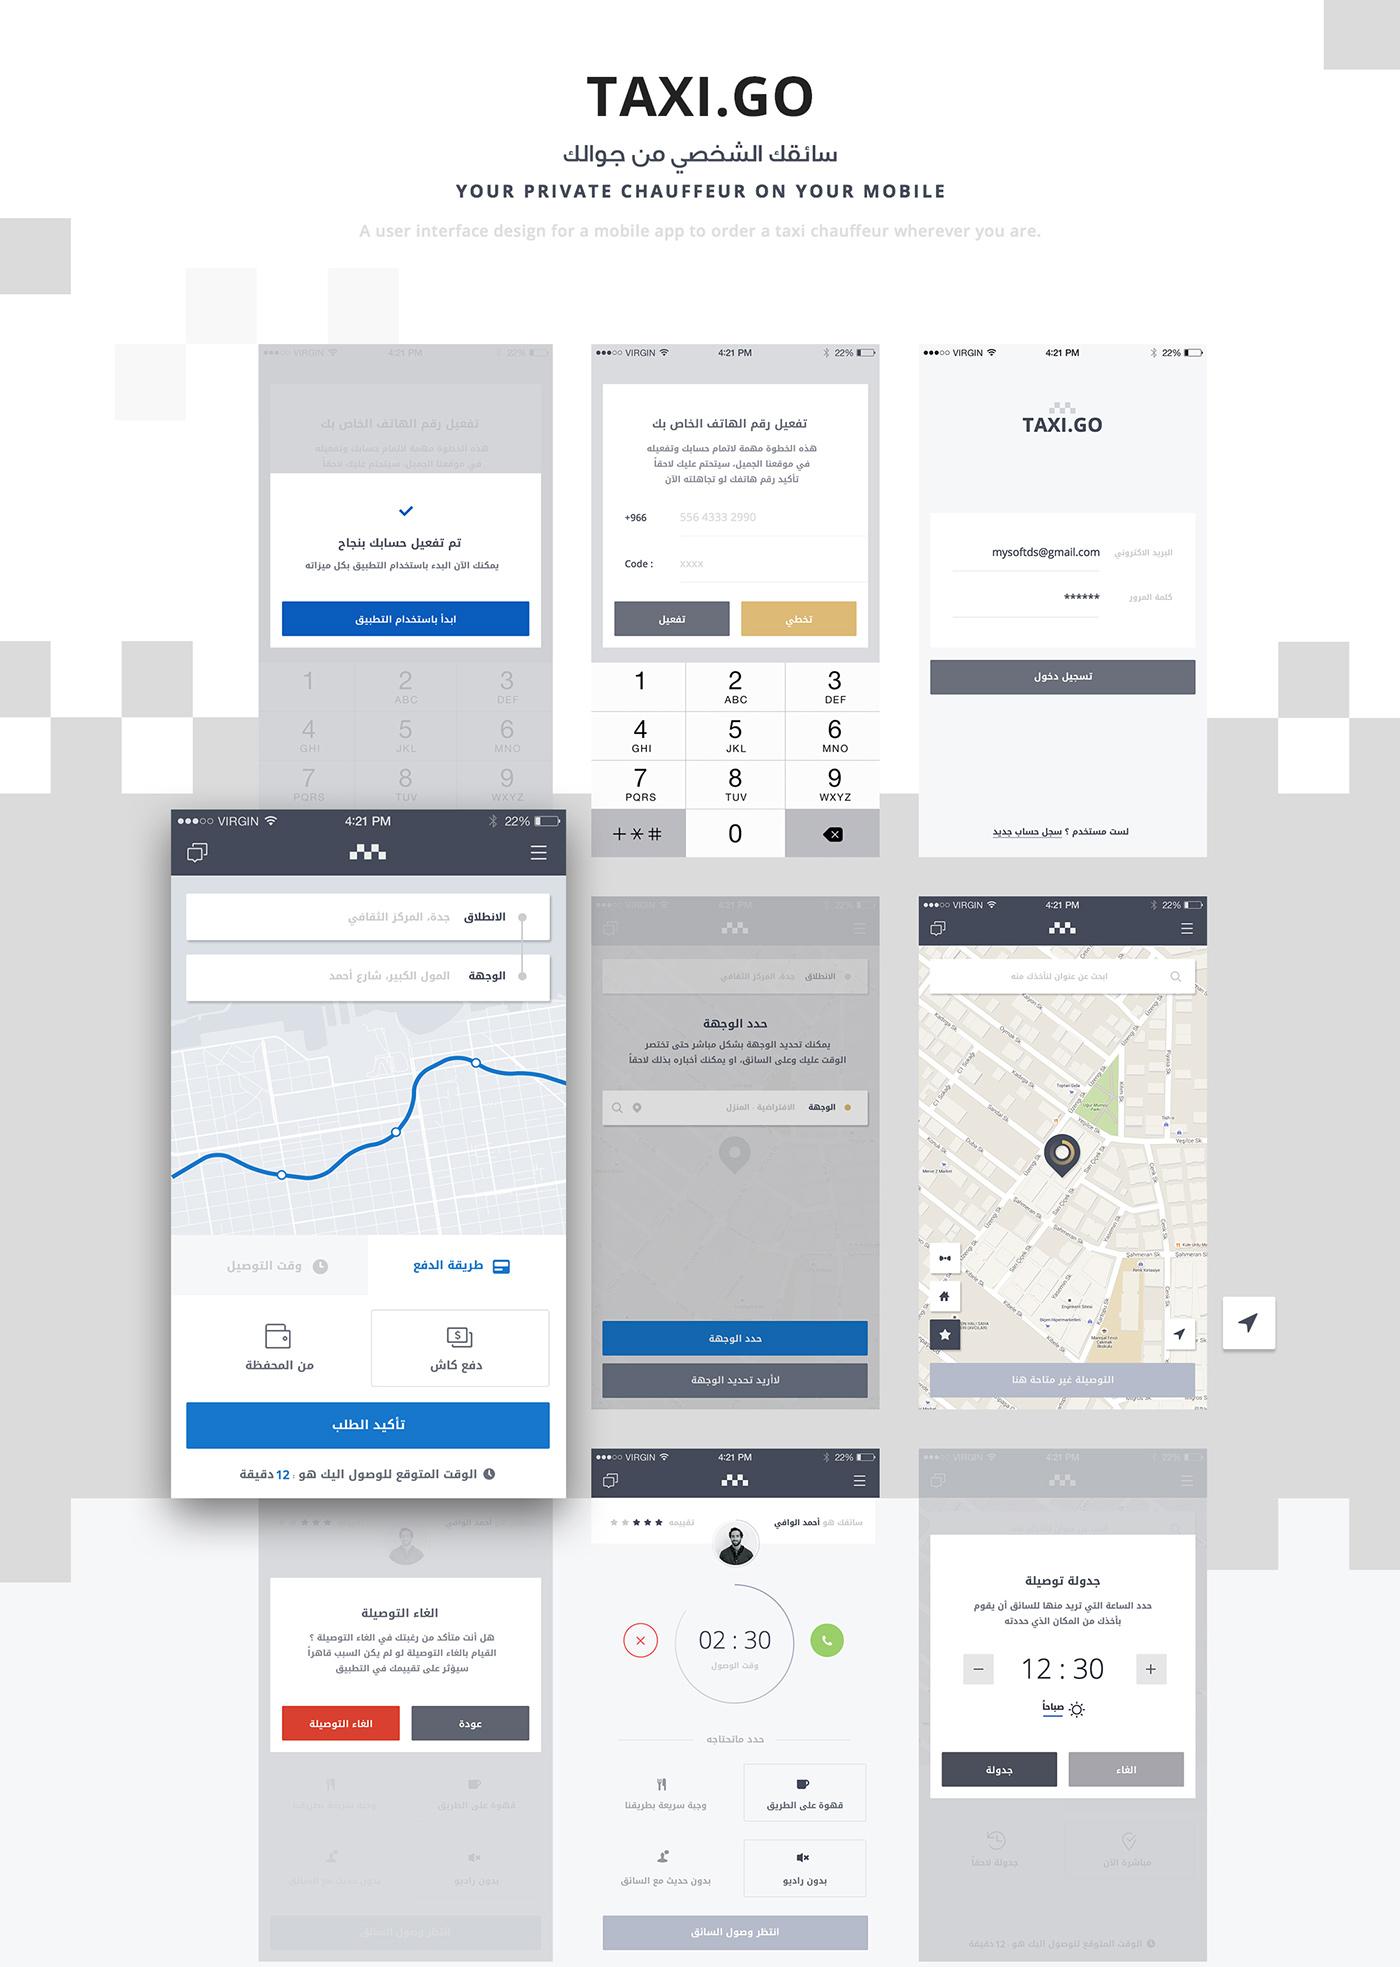 taxi app taxi app design Taxi UI chauffeur app taxi go app design